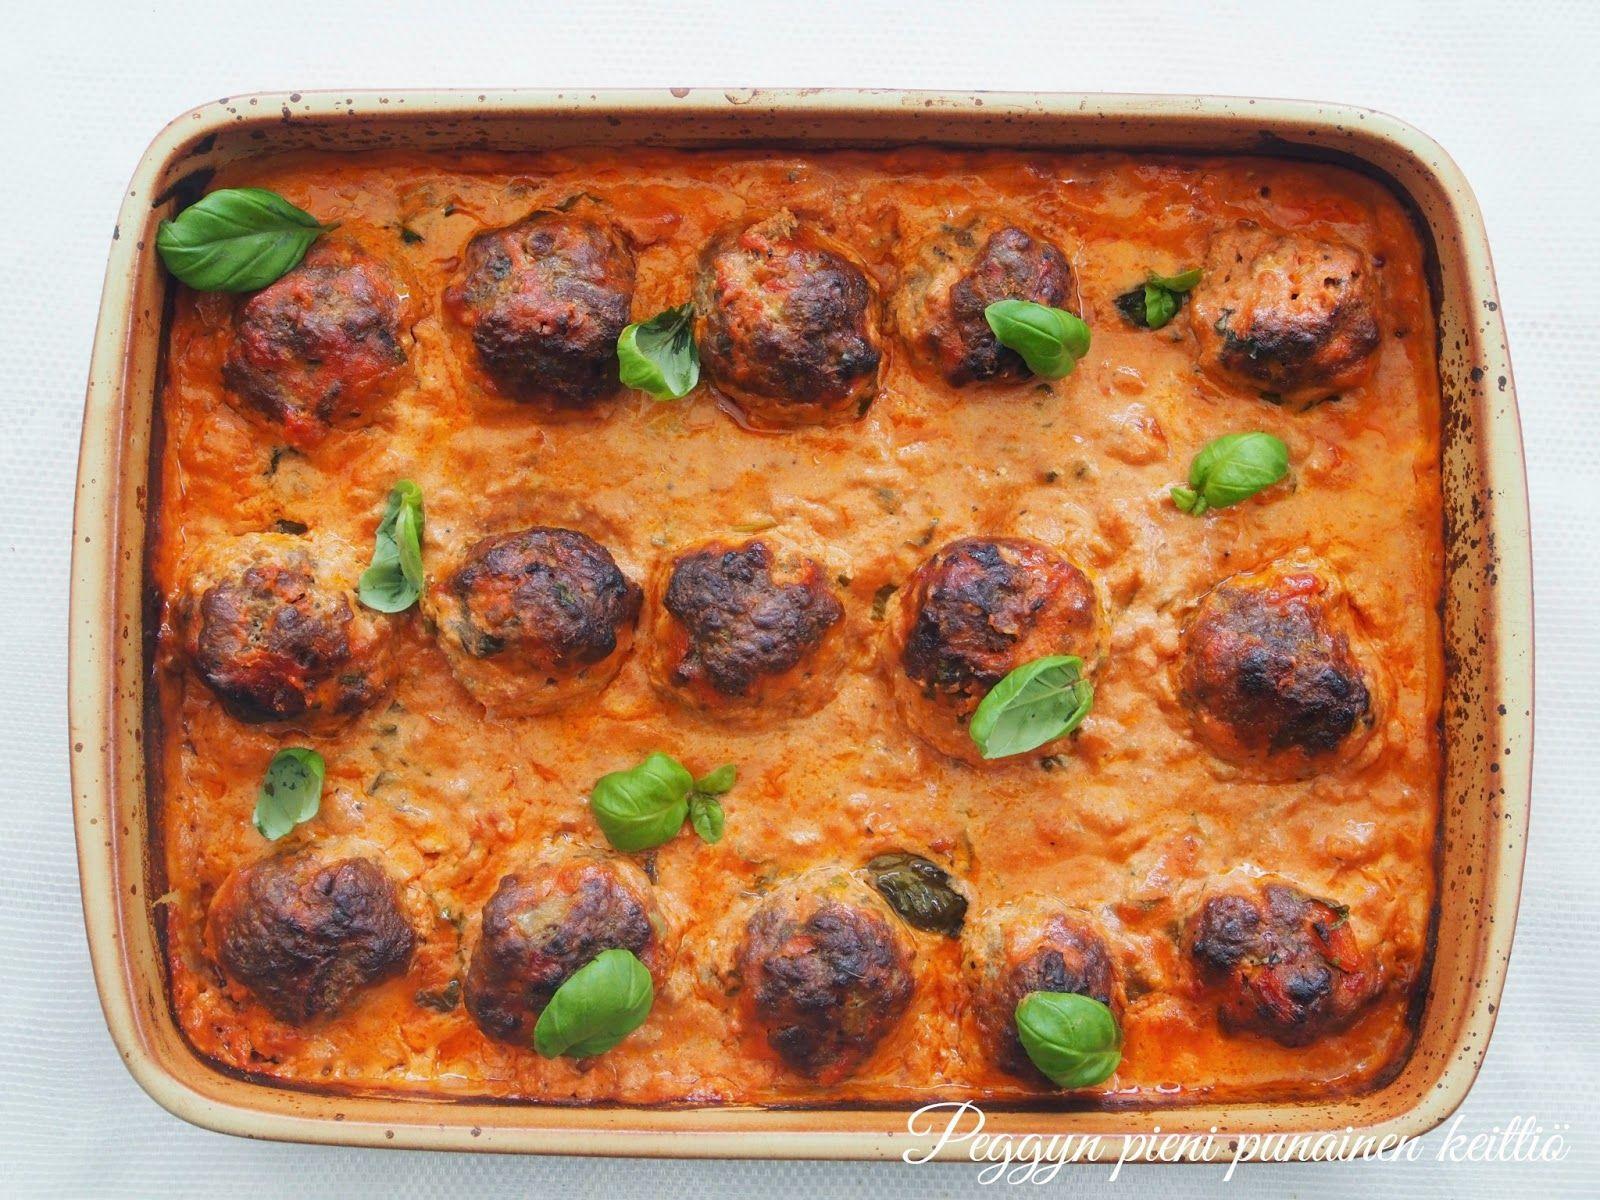 Peggyn pieni punainen keittiö: Lihapullat Peggyn tapaan